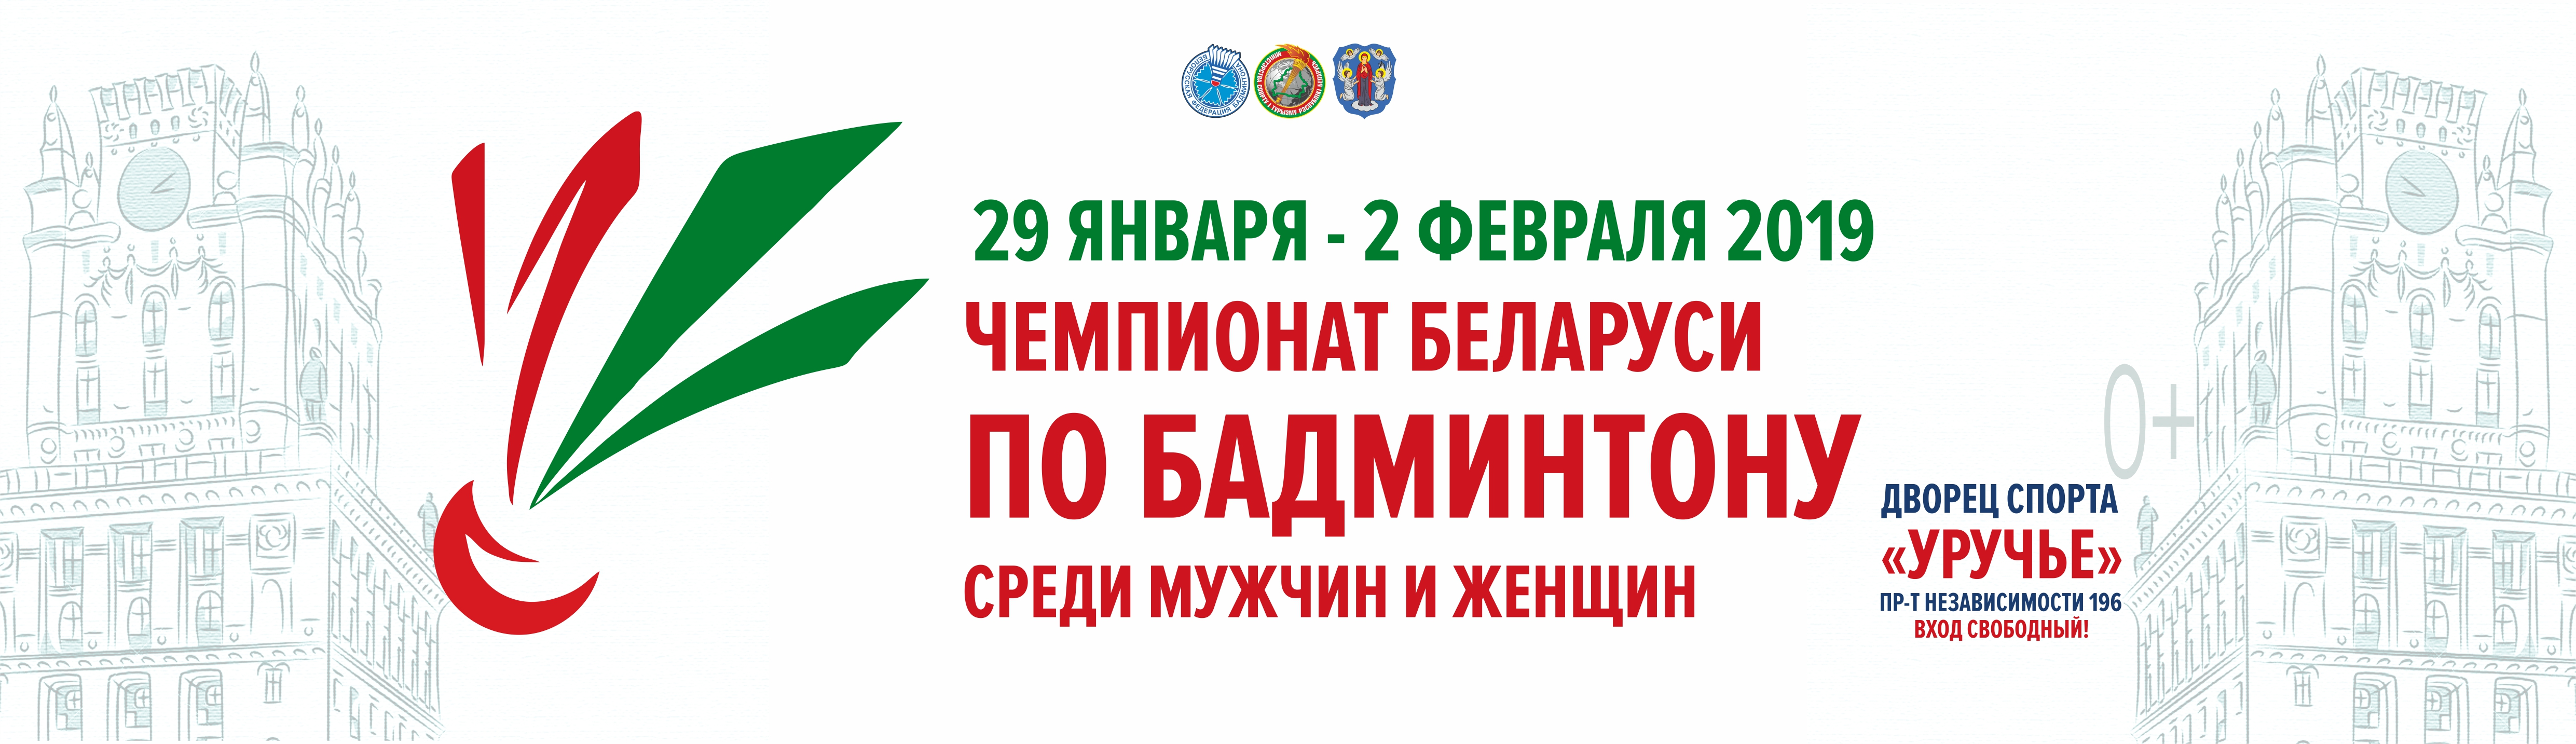 Чемпионат Беларуси по бадминтону (мужчины, женщины) день 4 — корт 1